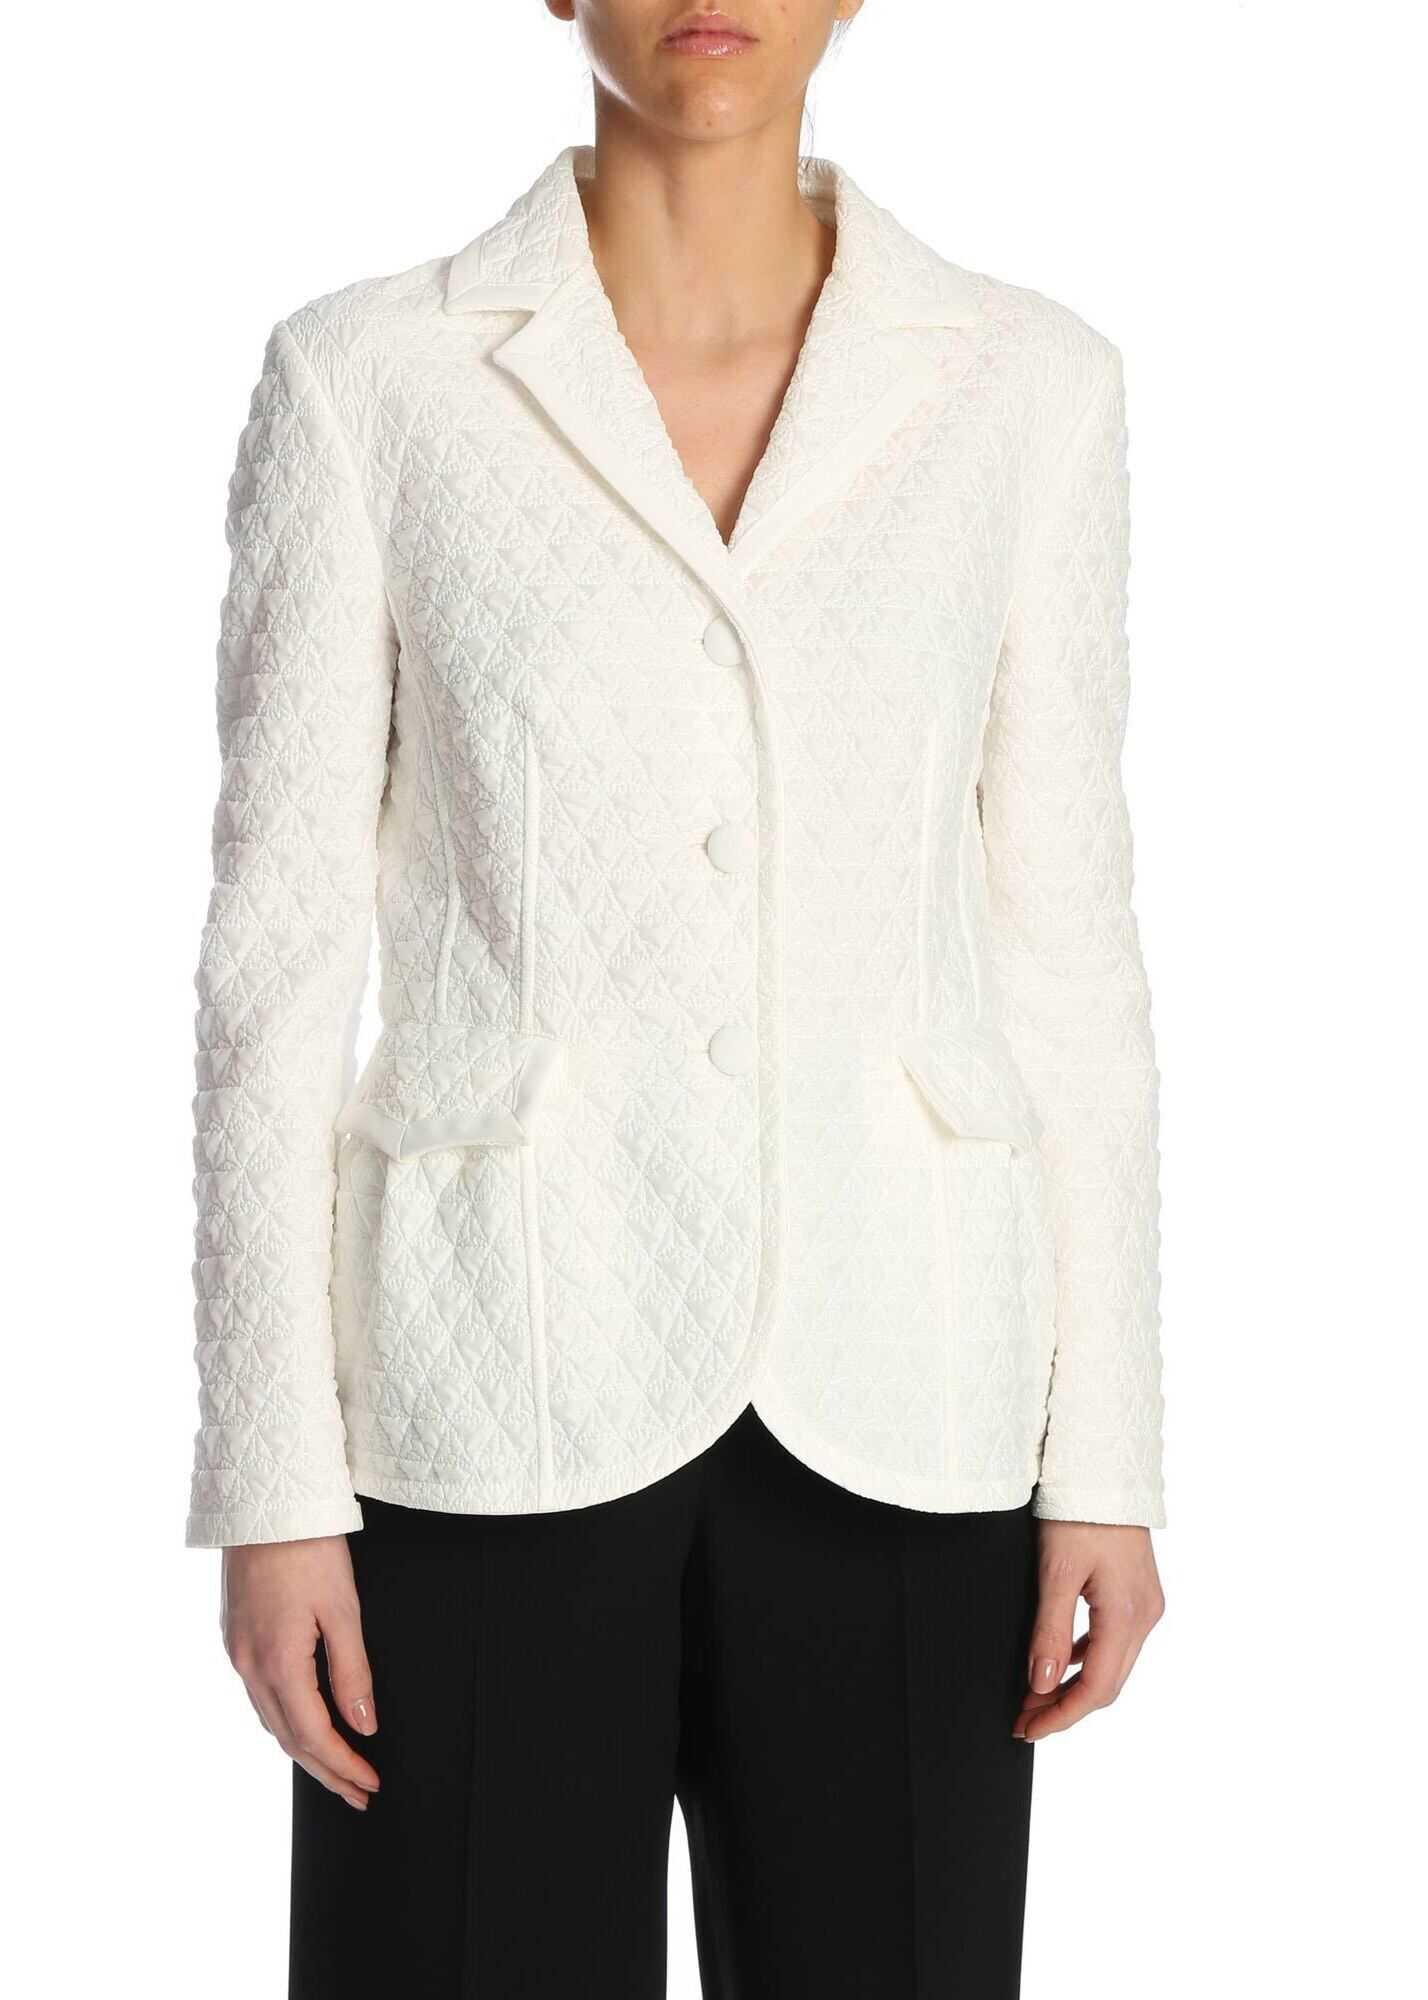 Ermanno Scervino Slimfit Padded Jacket In White White